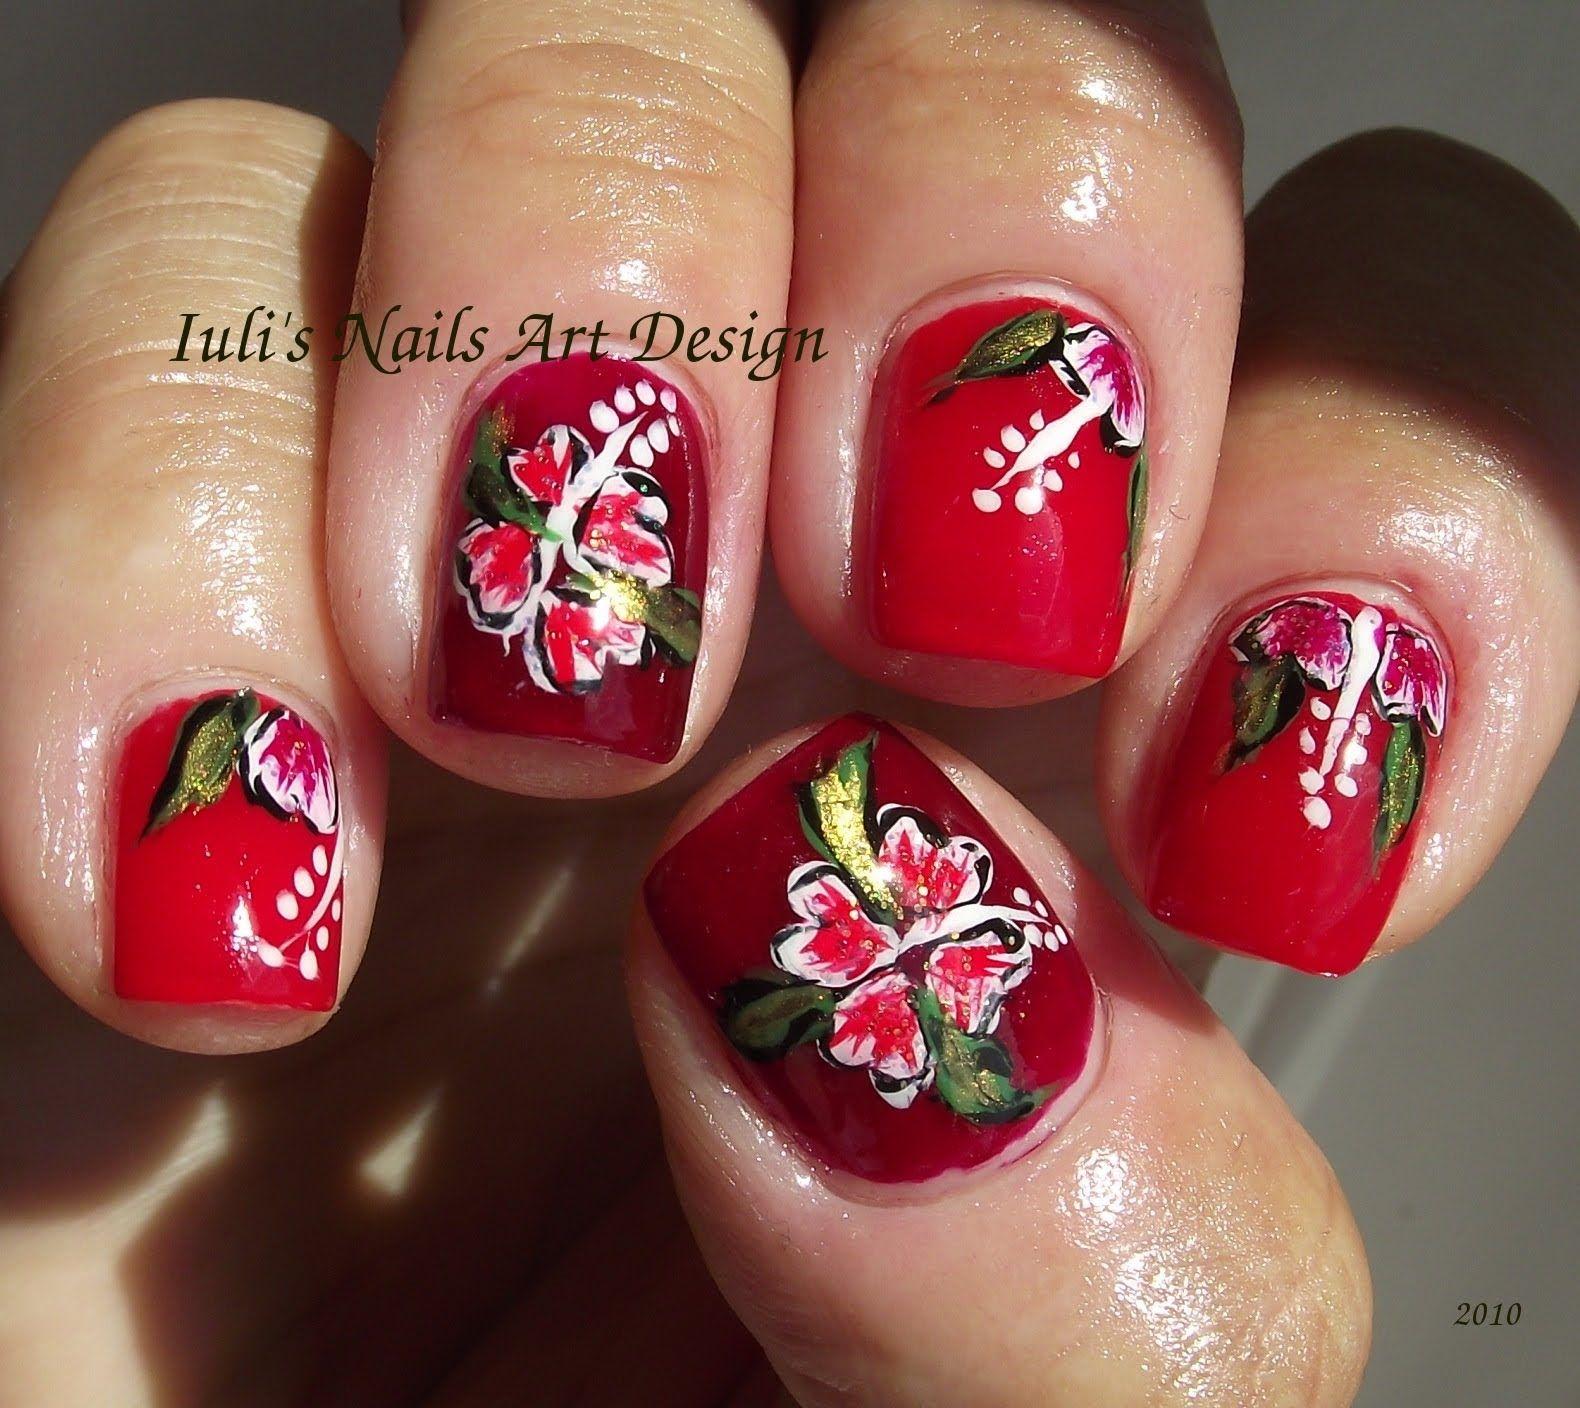 Nail Hawaiian Flowers Maxresdefault Jpg Nail Art Designs Nail Art For Beginners Nail Art